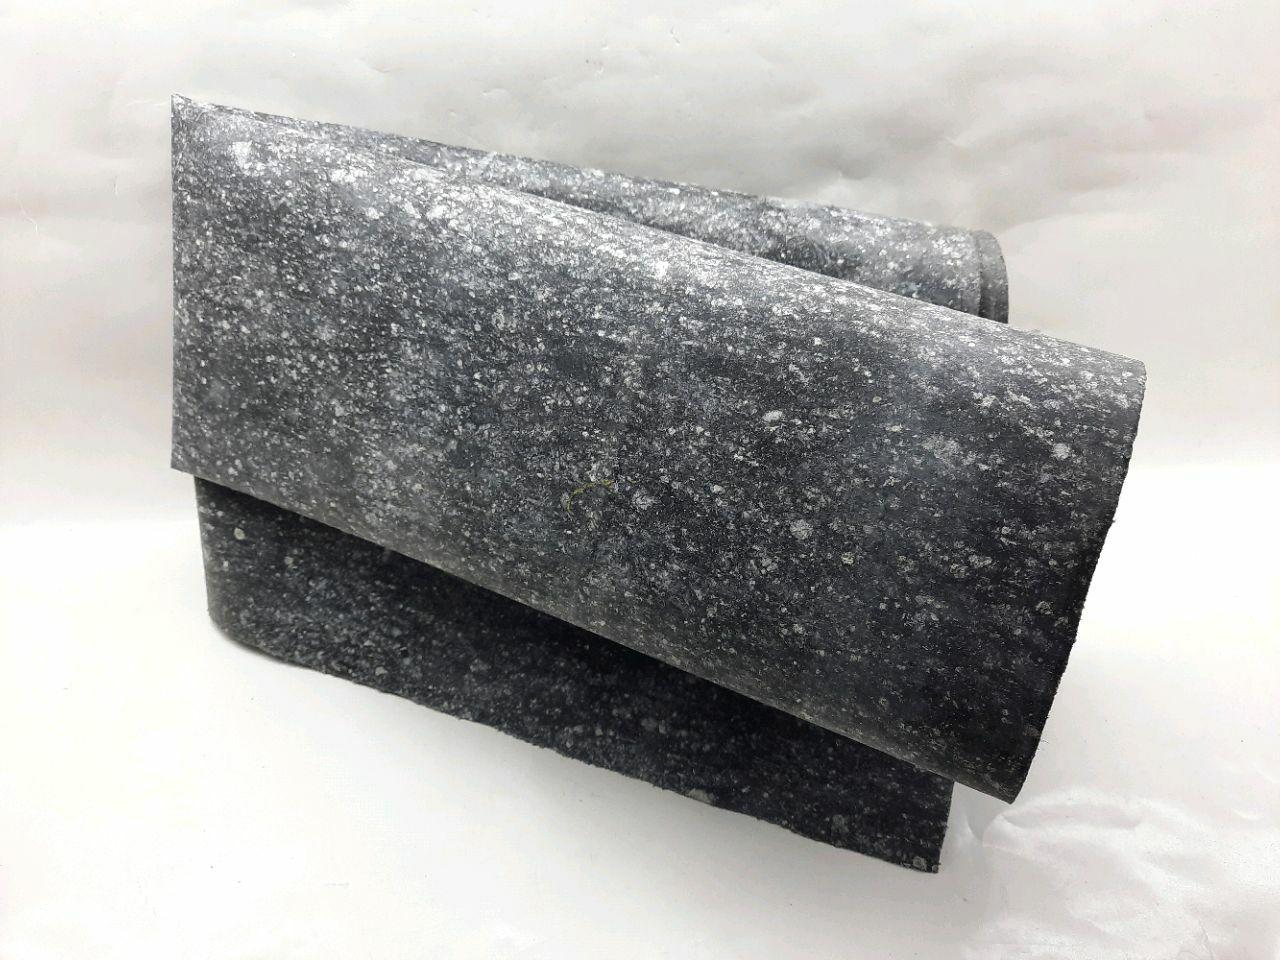 Paronit rezistent ulei/combustibil 1.0 mm (kg) VATI